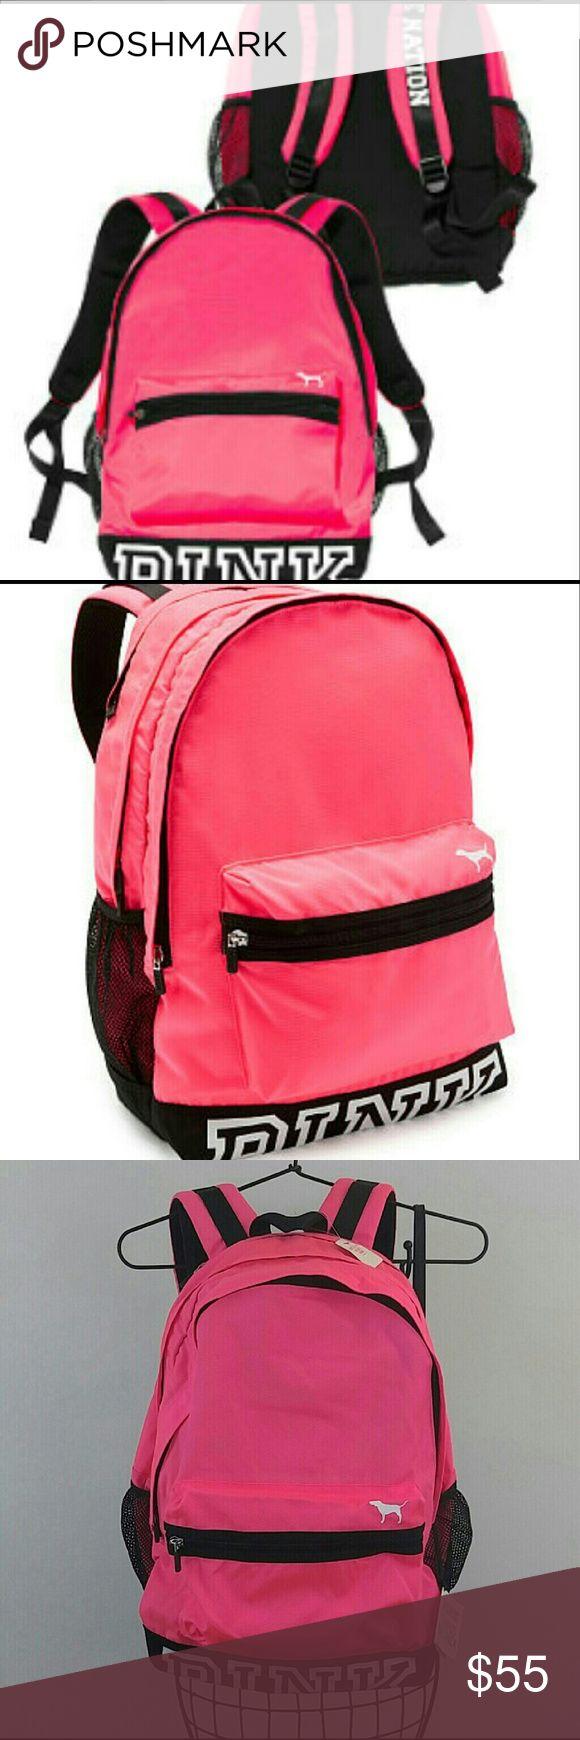 New Victoria's Secret PINK backpack school bag Victoria's Secret Pink backpack  New  Neon pink PINK Victoria's Secret Other